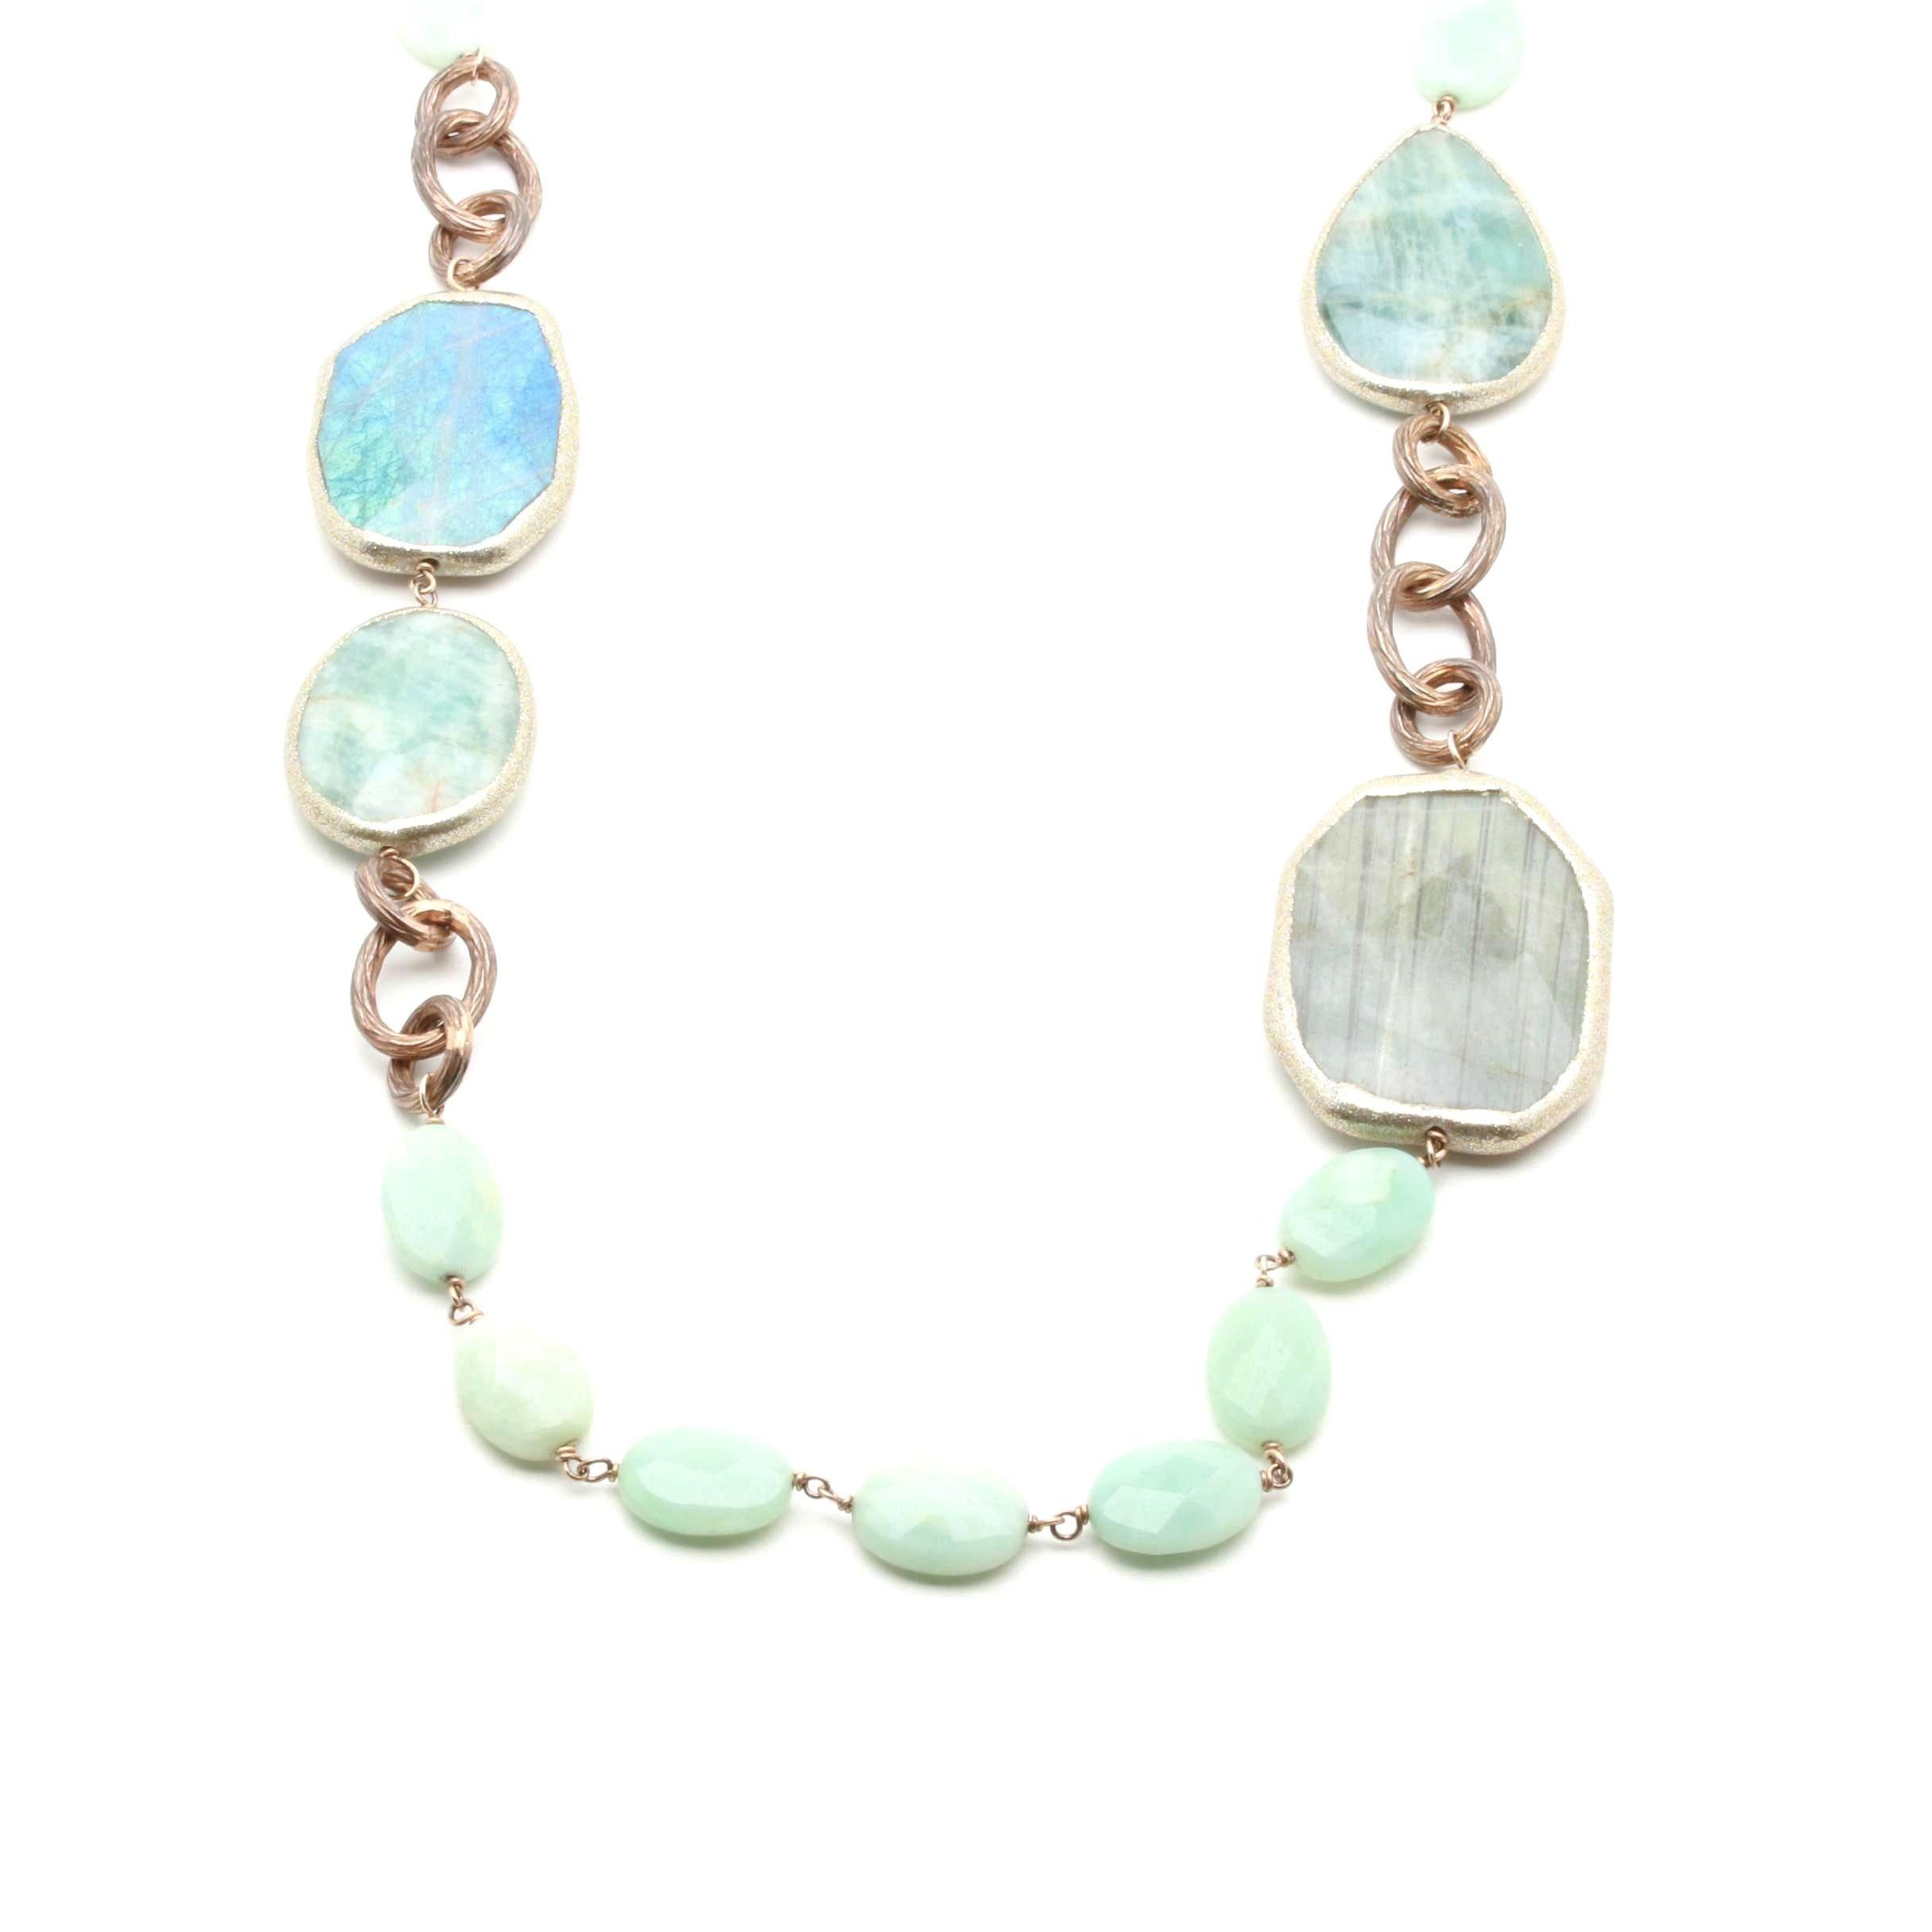 Estrosia Sterling Silver Aquamarine and Labradorite Necklace